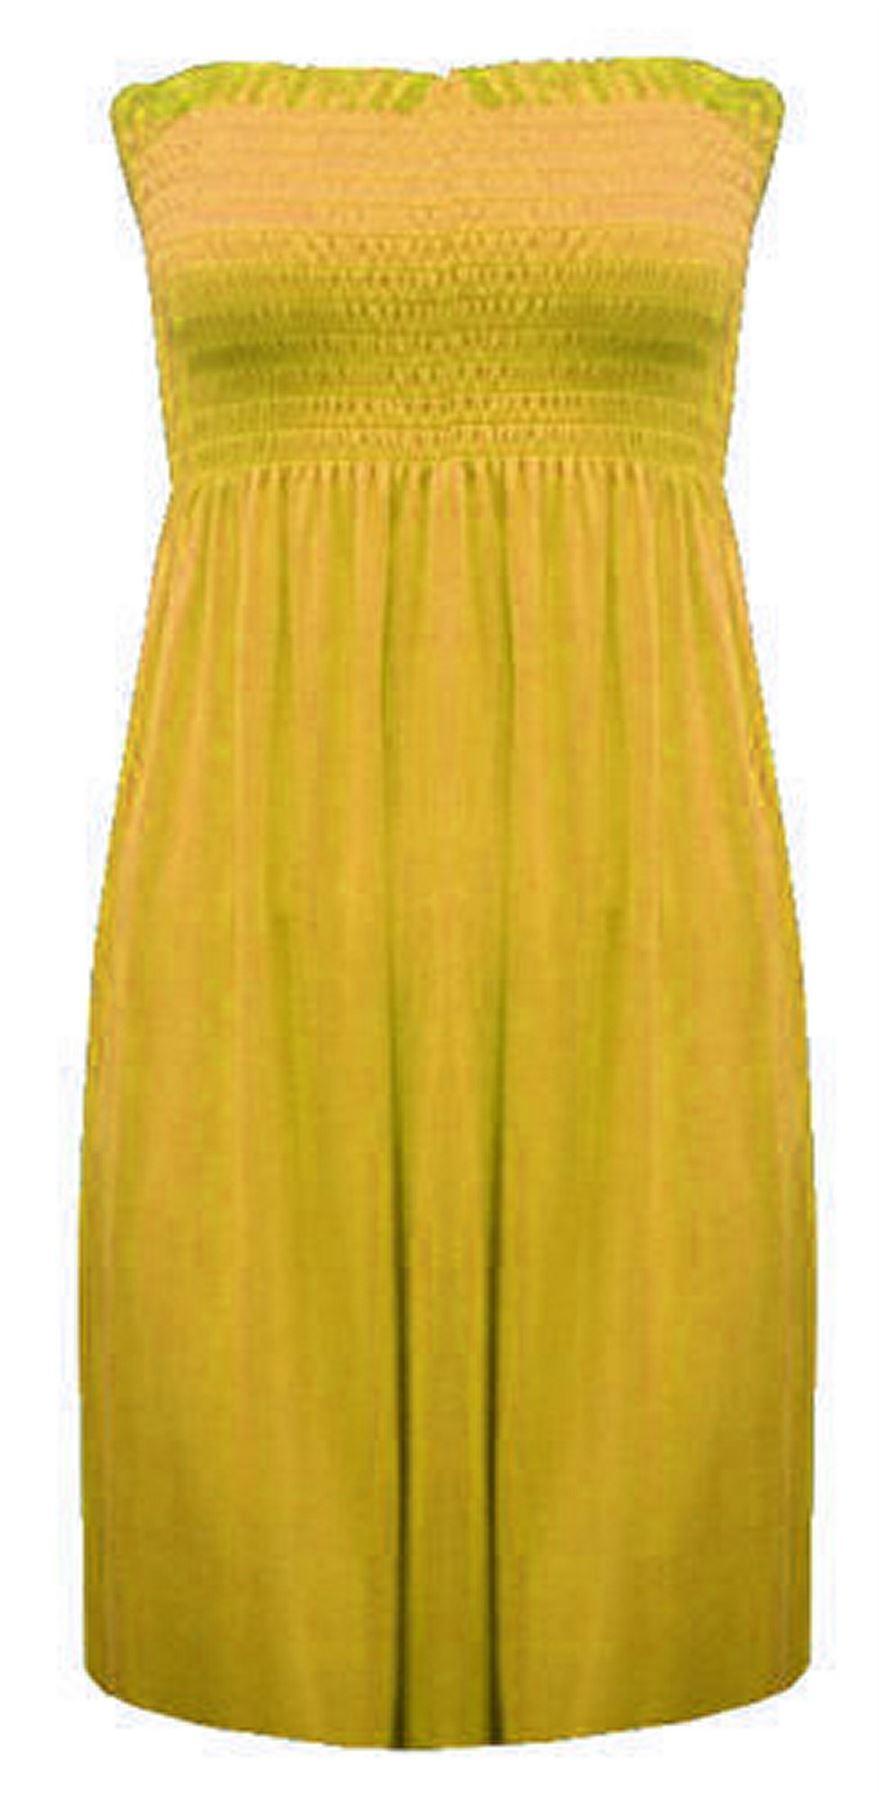 New-Ladies-Bandeau-Boob-Gathering-Tops-Boob-Tube-Beach-Wear-Tunics-8-26 thumbnail 91